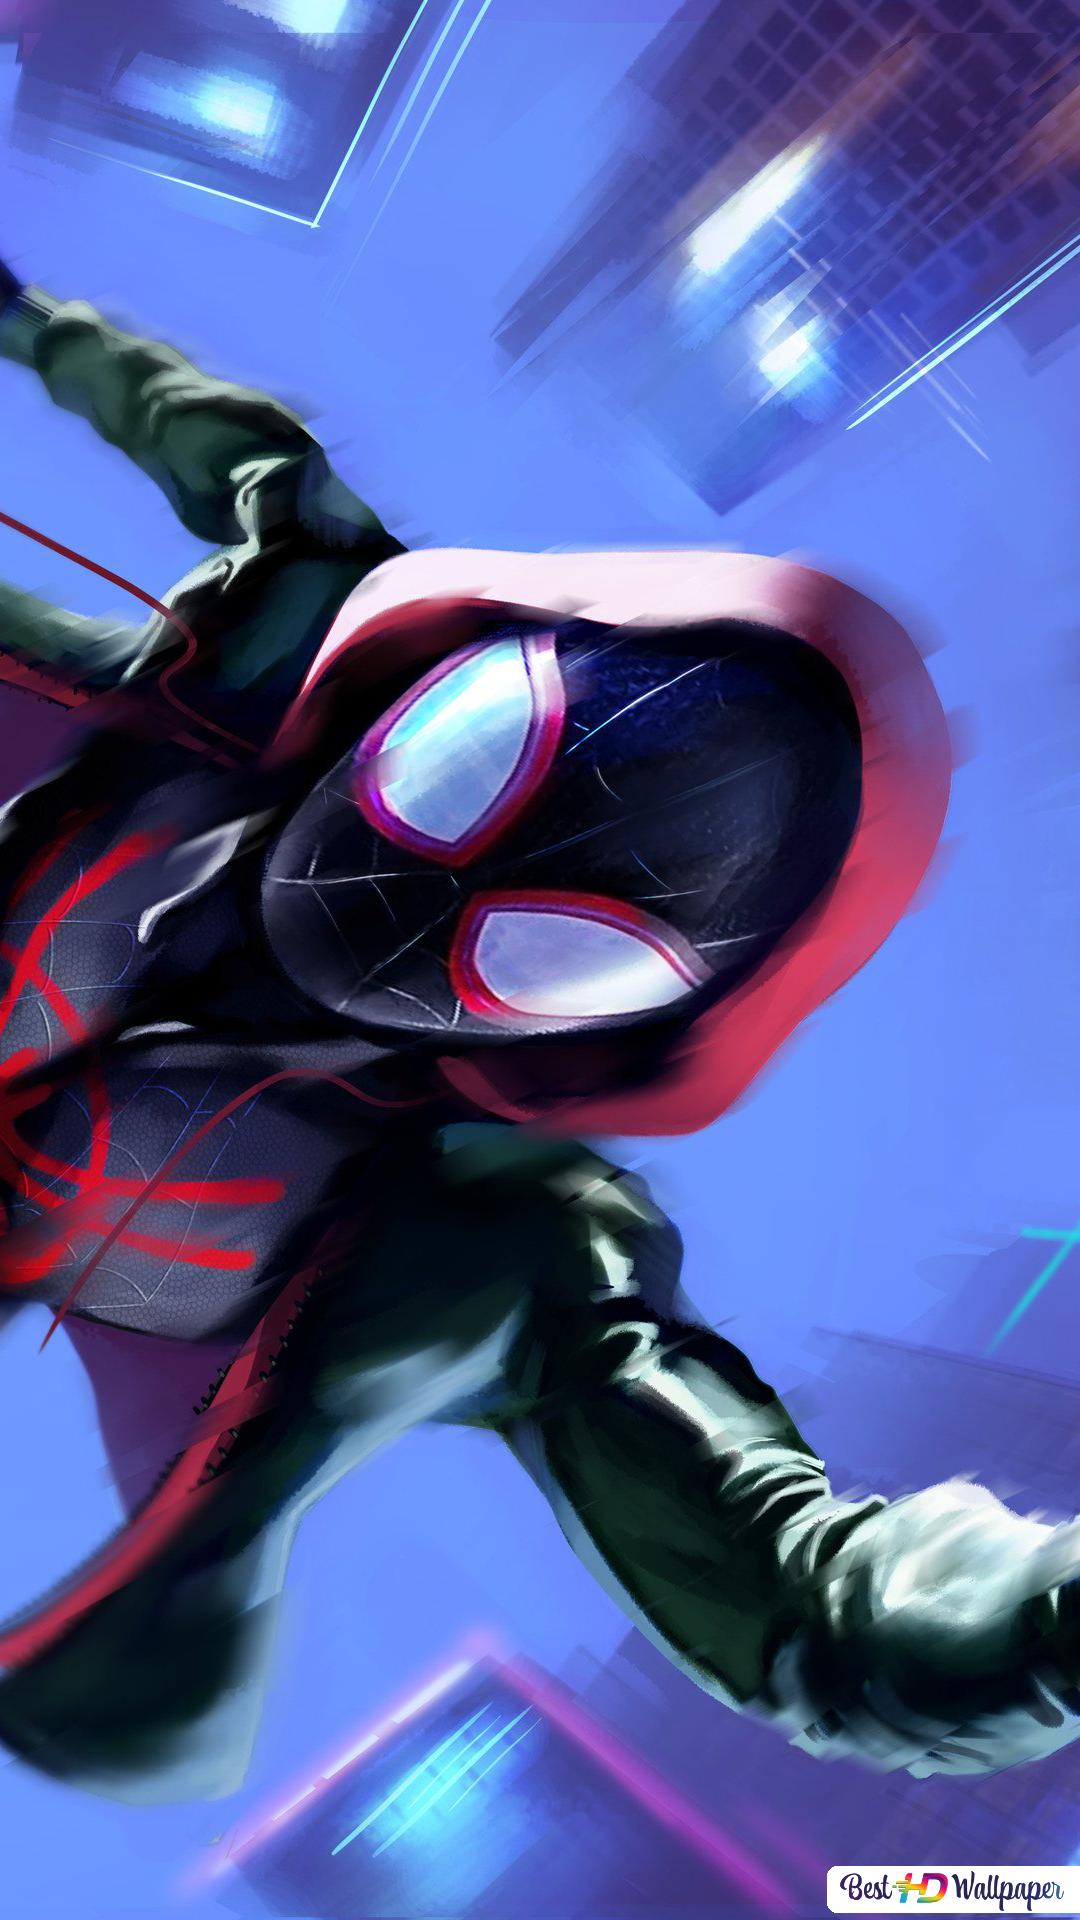 Spider Man Noir Iphone Wallpaper The Galleries Of Hd Wallpaper